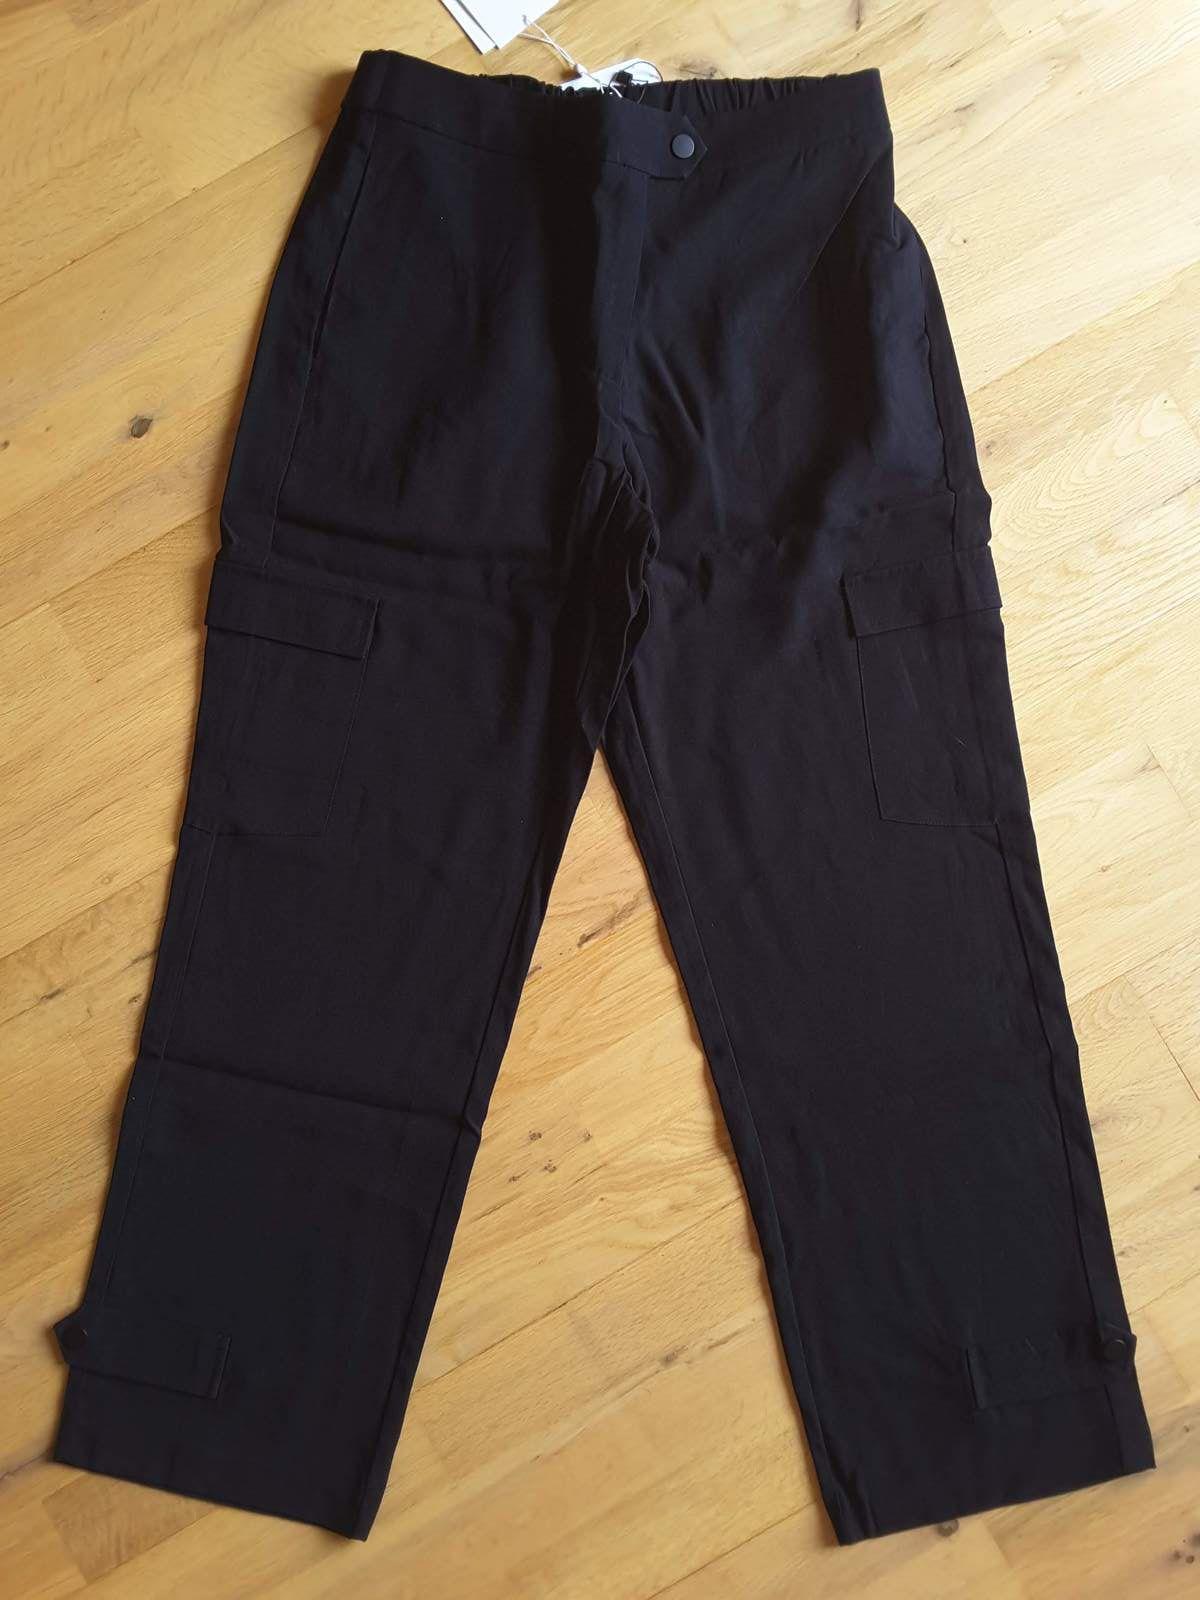 pantalon Vithyra Pant dark black - Vila lookiero missbonsplansdunet personal shopper box vêtement